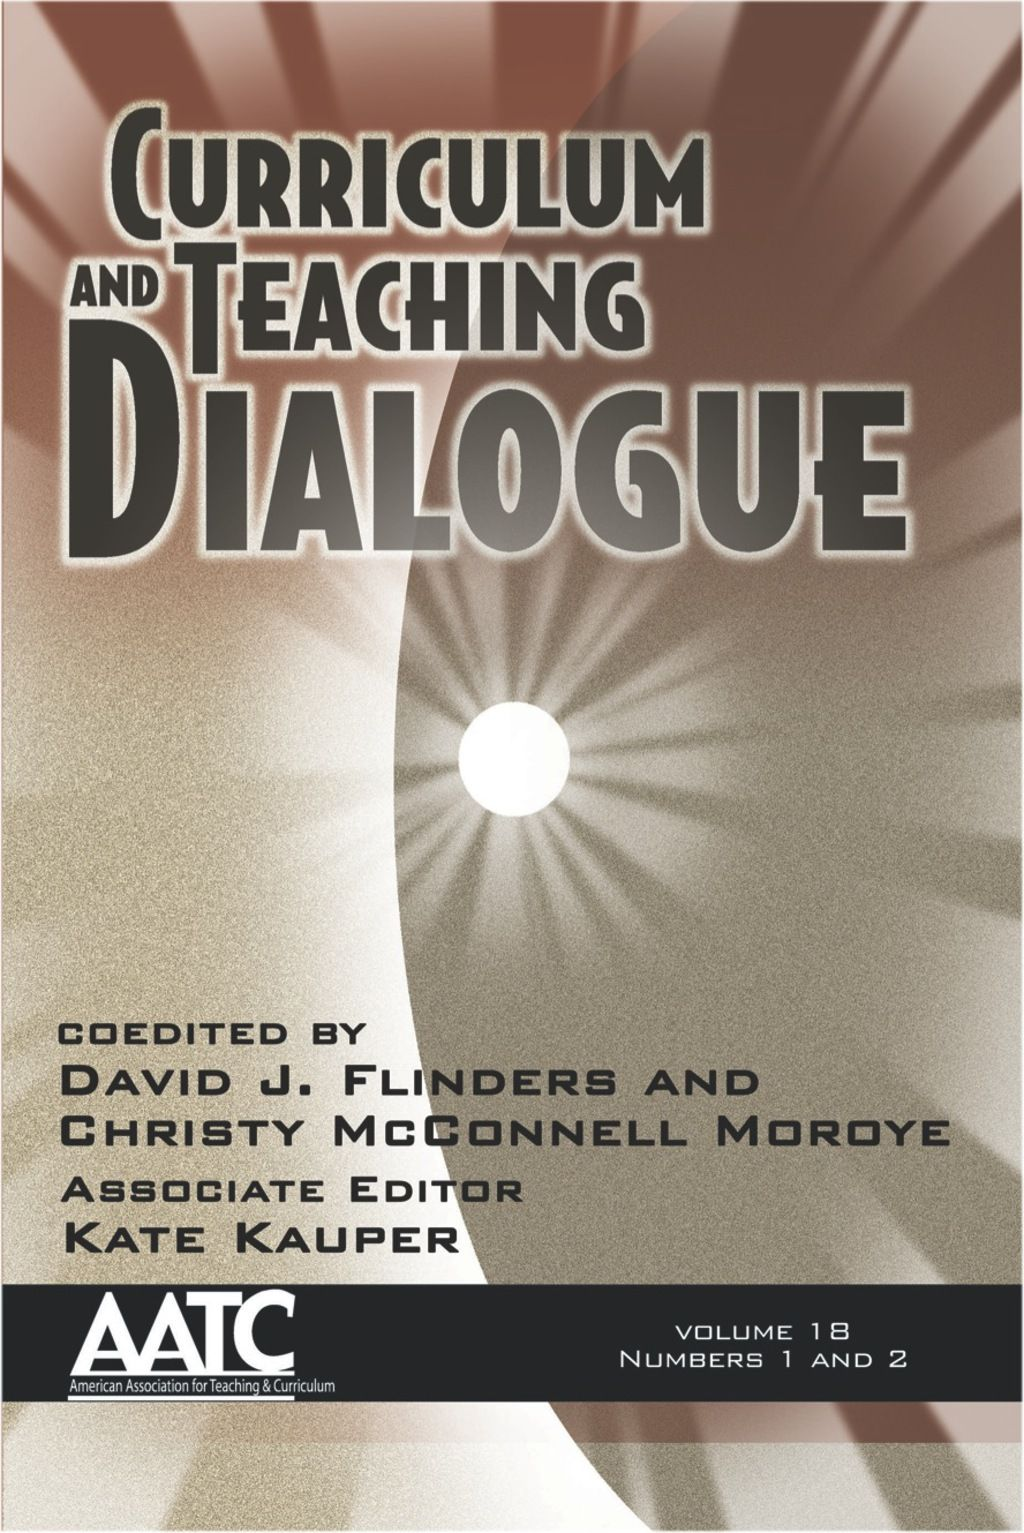 Curriculum and Teaching Dialogue Vol  18  1 & 2 (eBook Rental) is part of Teaching dialogue, Curriculum, Teaching, Dialogue, Ebook, Information age - eBook Rental  By David J  Flinders,  Christy M  Moroye PRINT ISBN 9781681236537 ETEXT ISBN 9781681236544 Edition 0